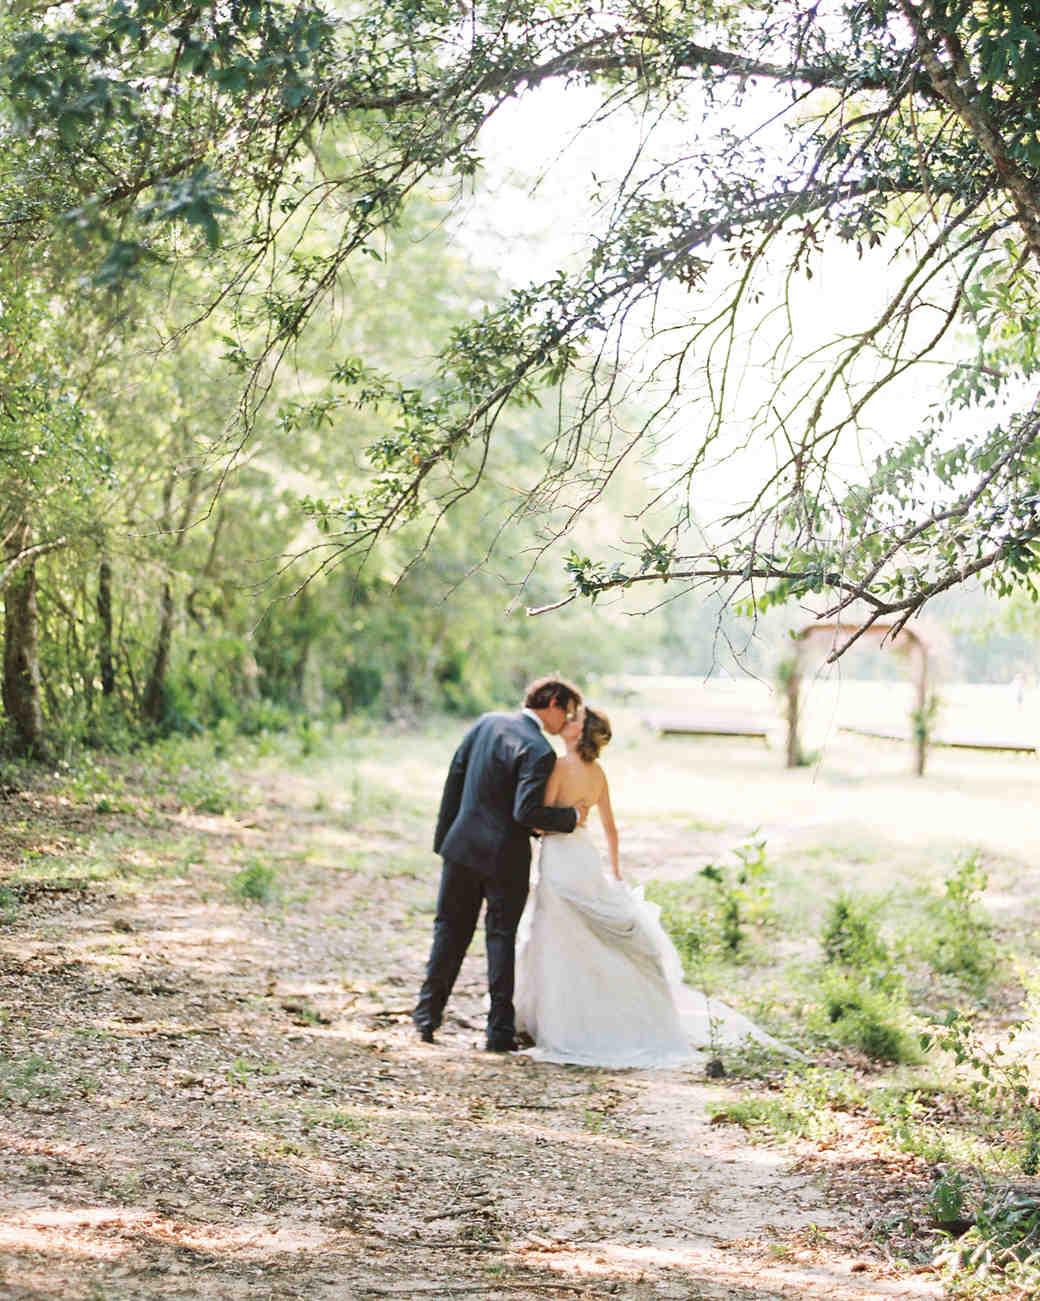 saron-neal-wedding-mississippi-00162-s111701.jpg